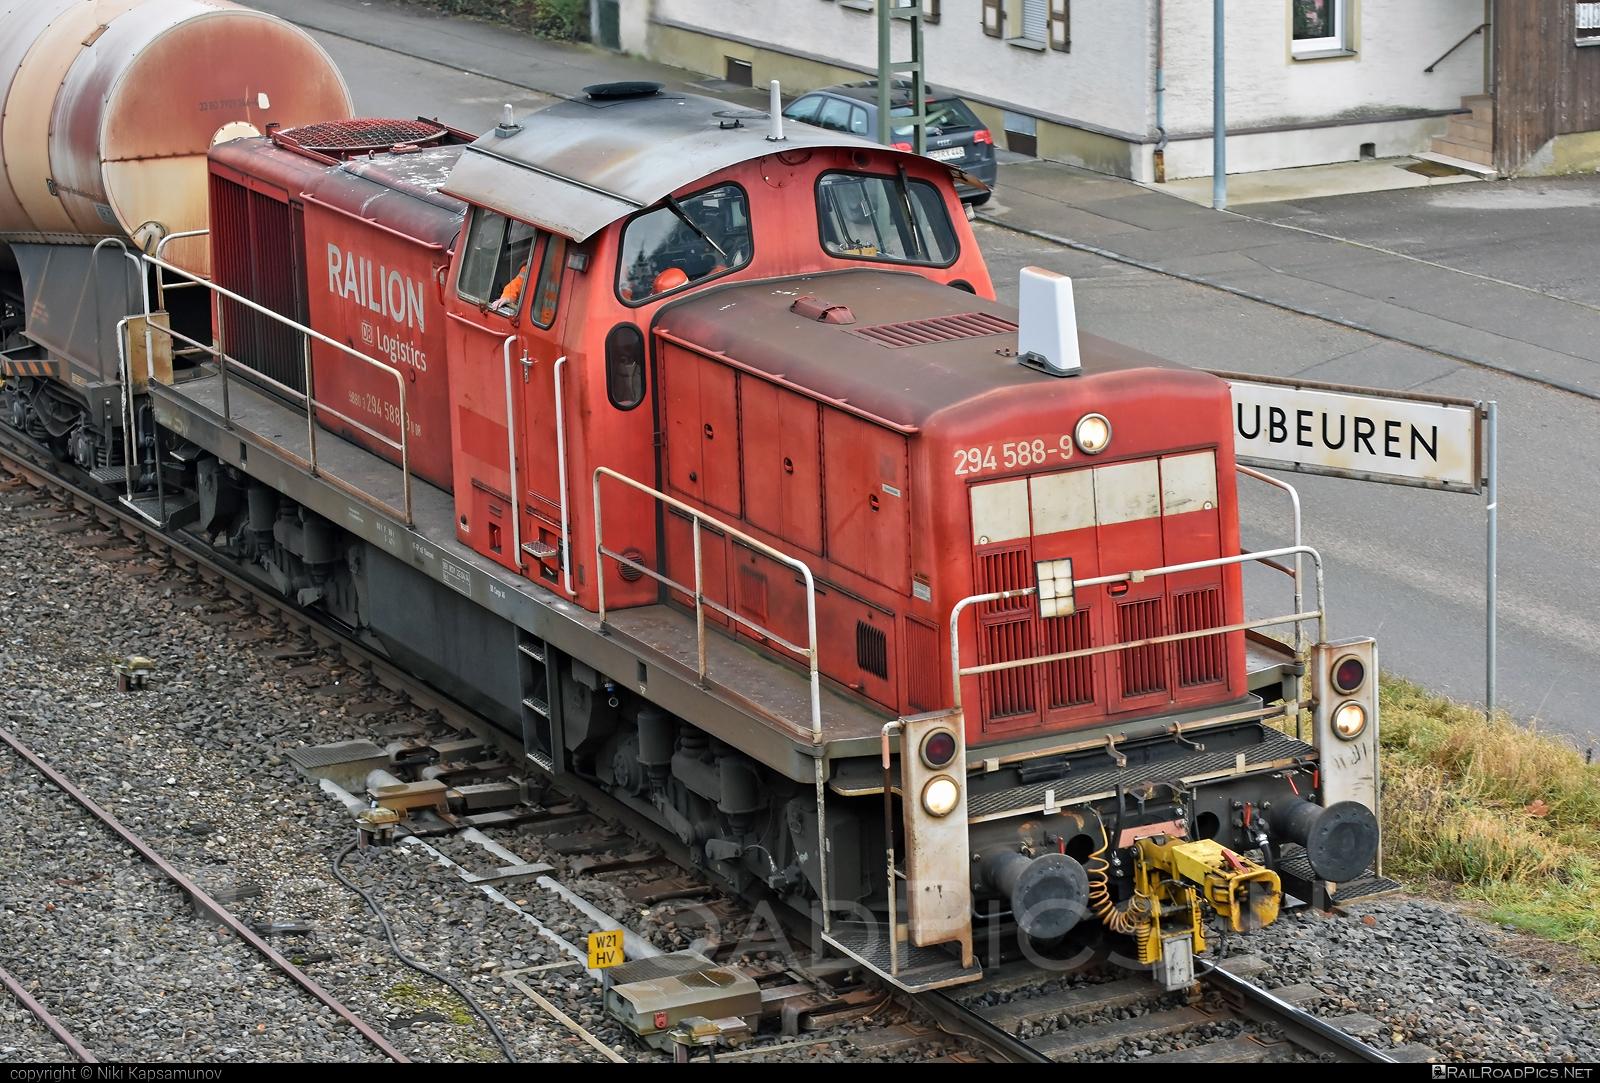 Deutz V90 - 294 588-9 operated by DB Cargo AG #db #dbcargo #dbcargoag #deutz #deutzv90 #locomotiveclassv90 #makv90